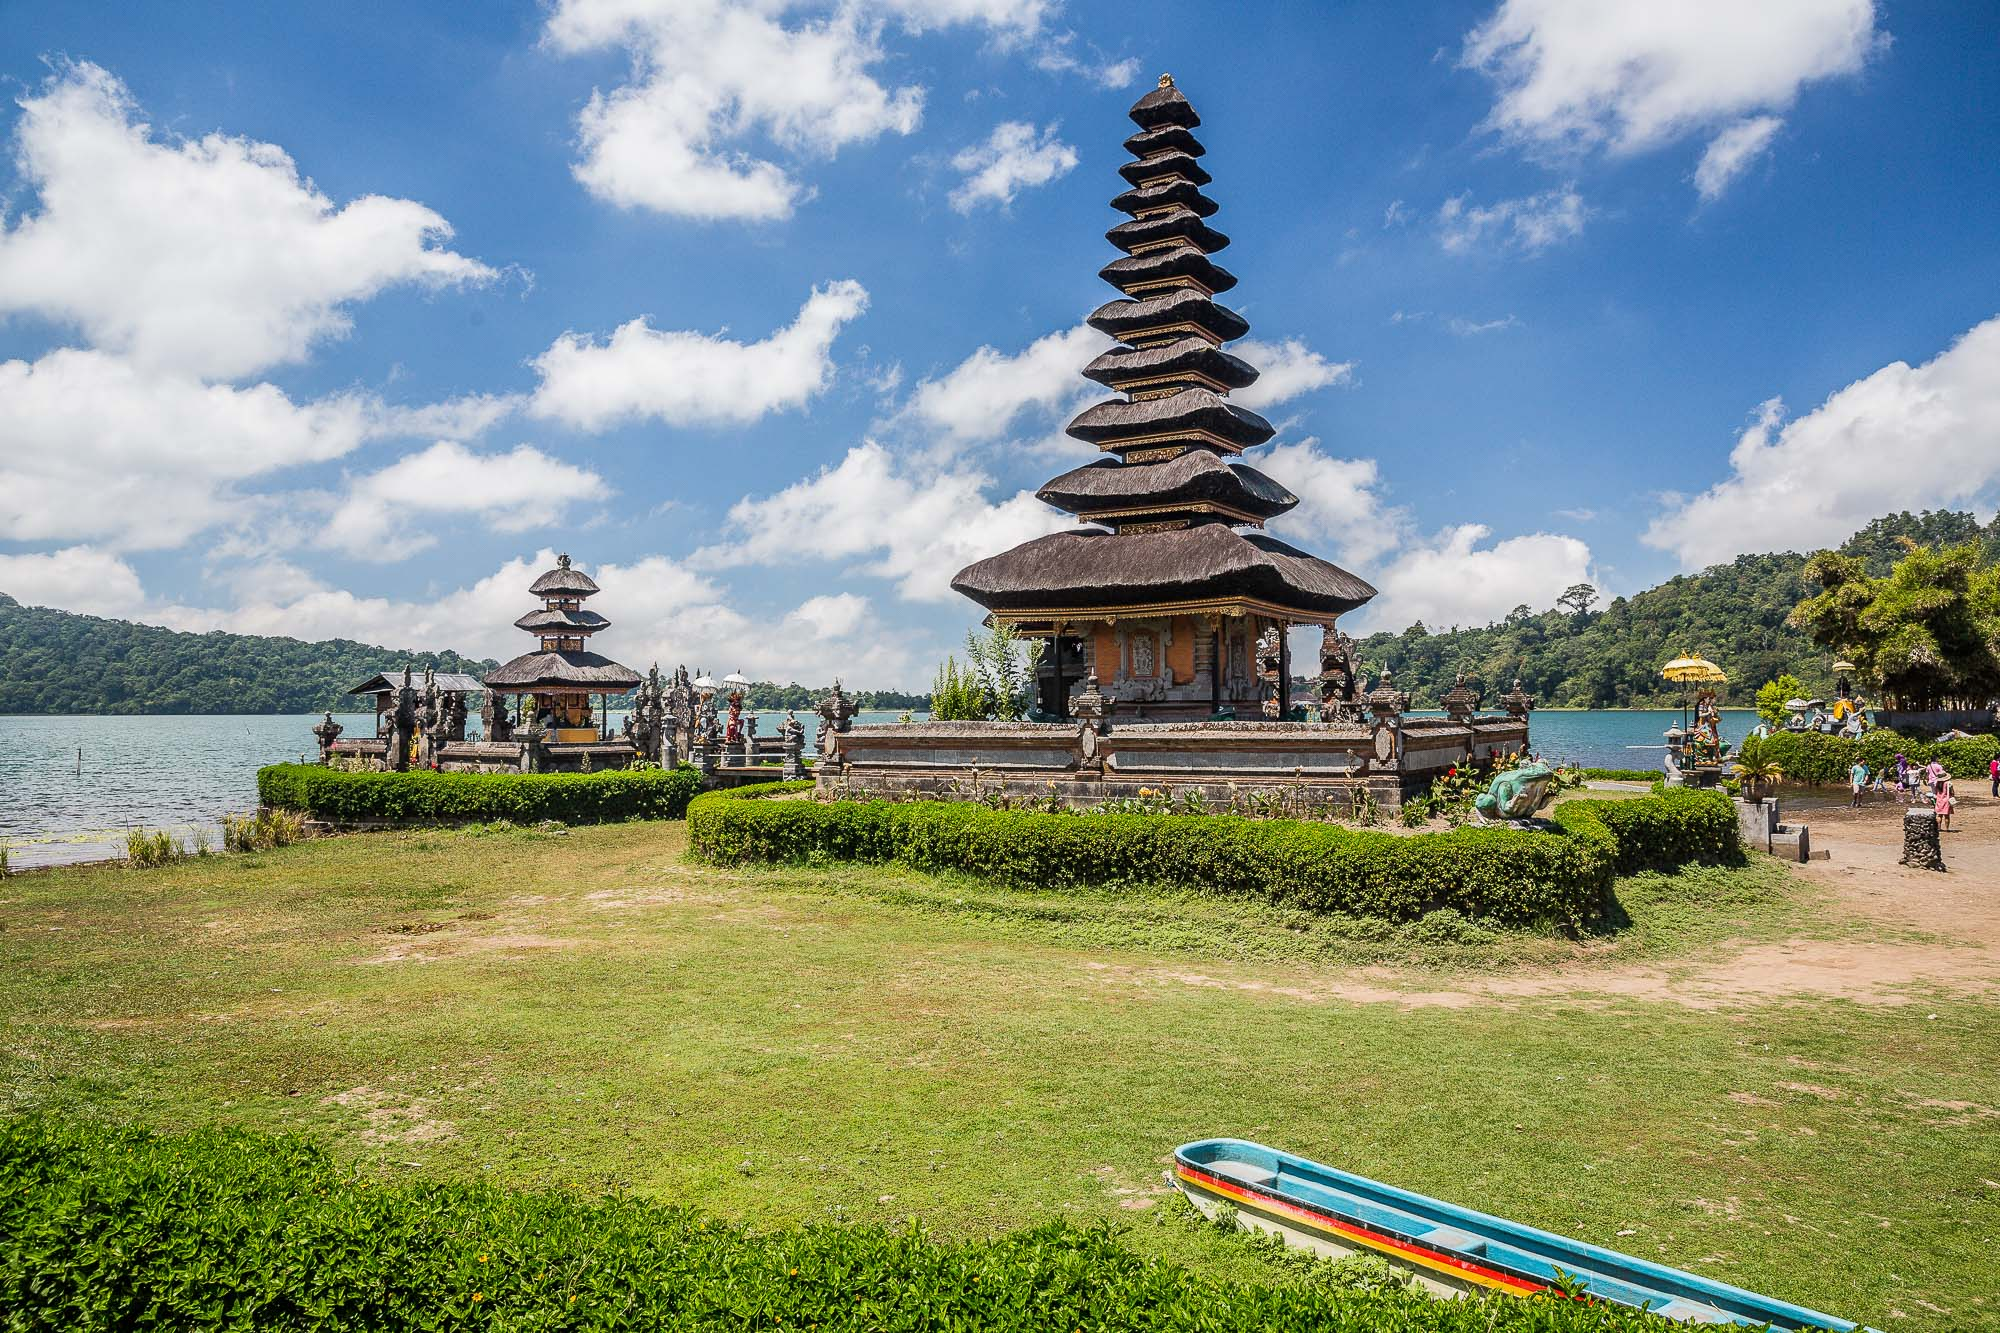 INDONESIA_2015_04 BALI_JusMedic_1149